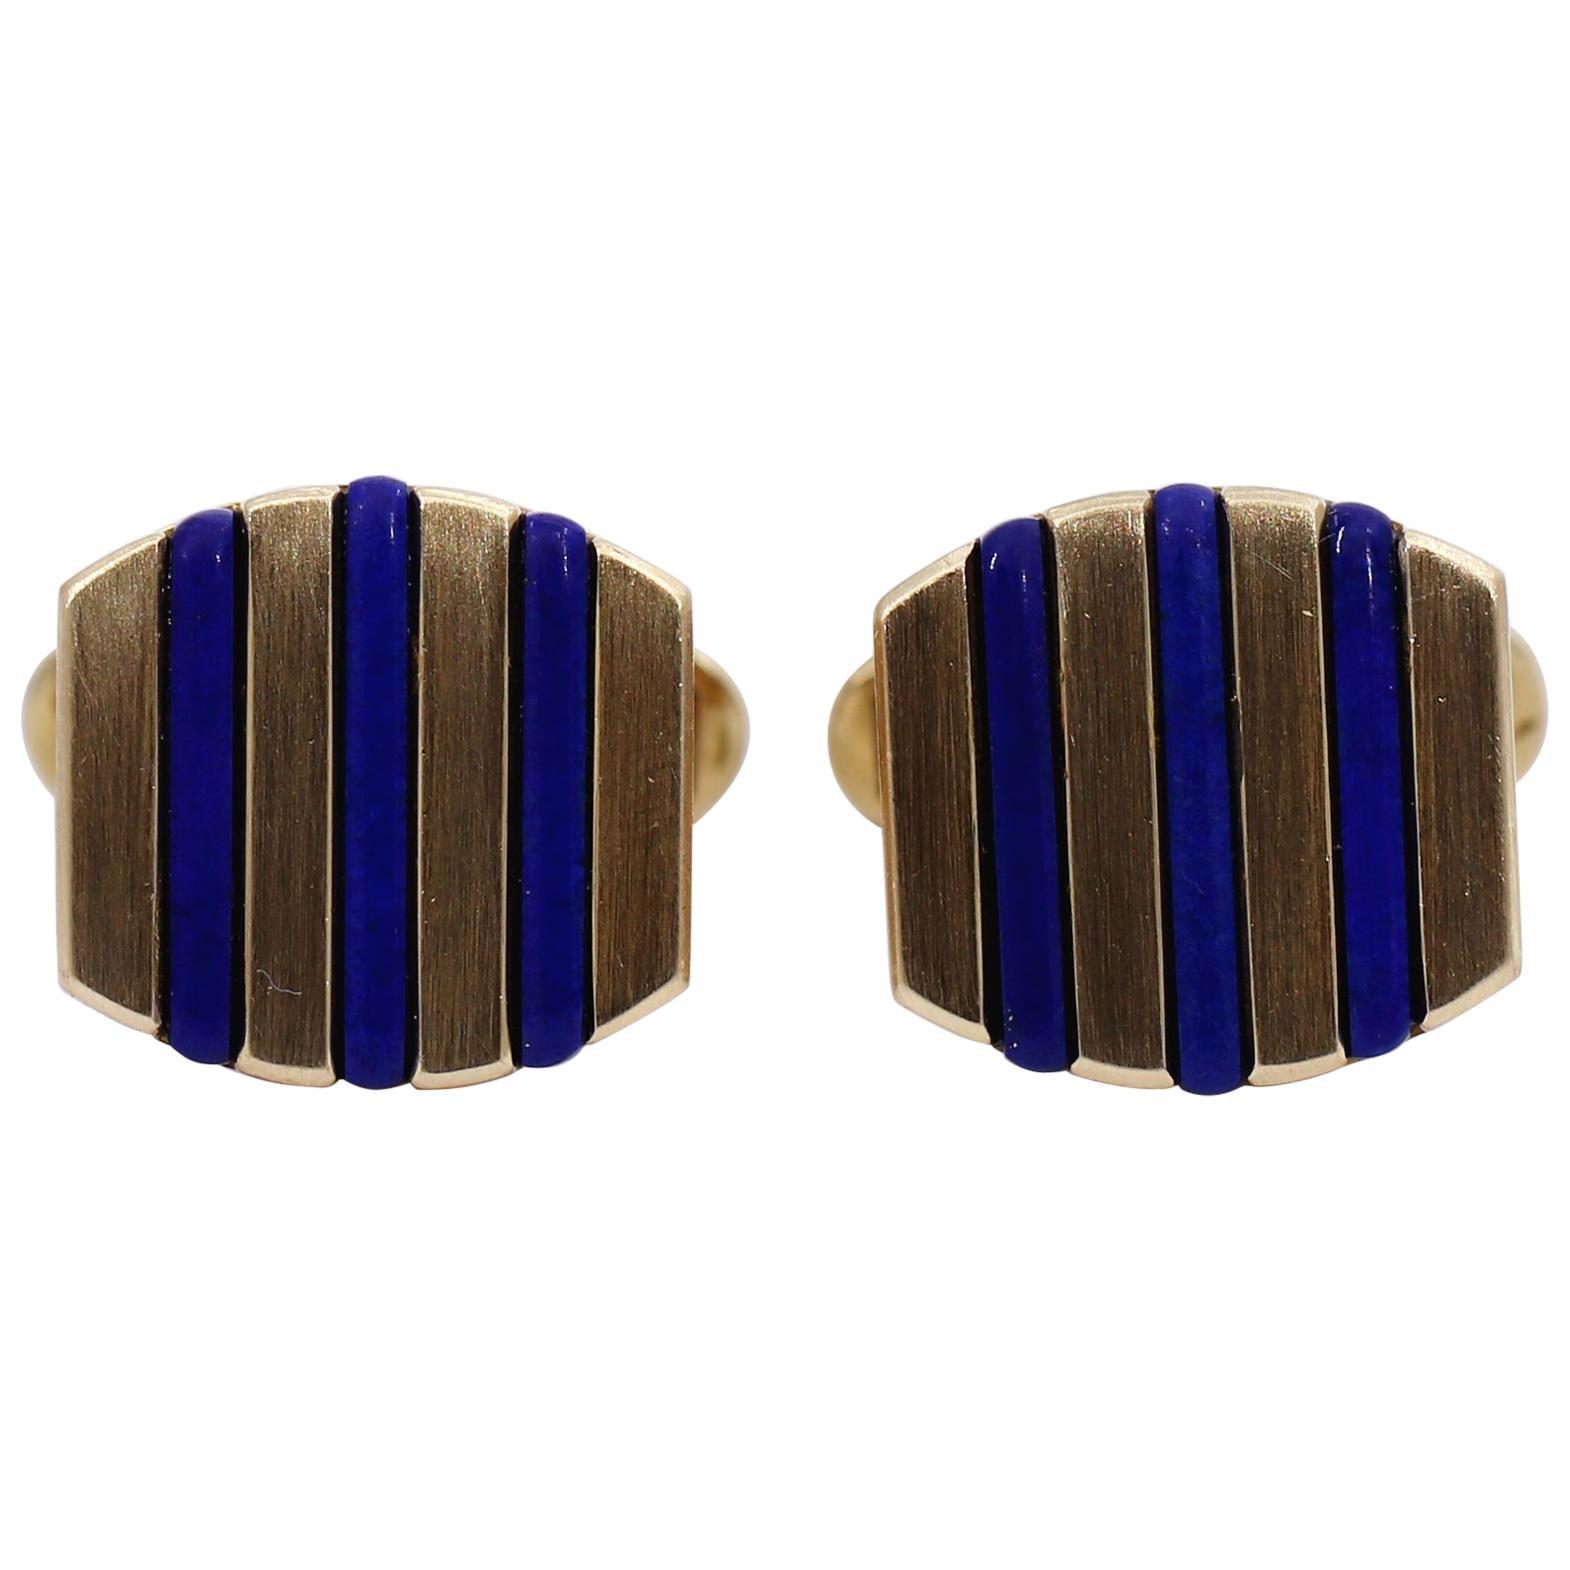 Gold and Lapis Lazuli Cufflinks